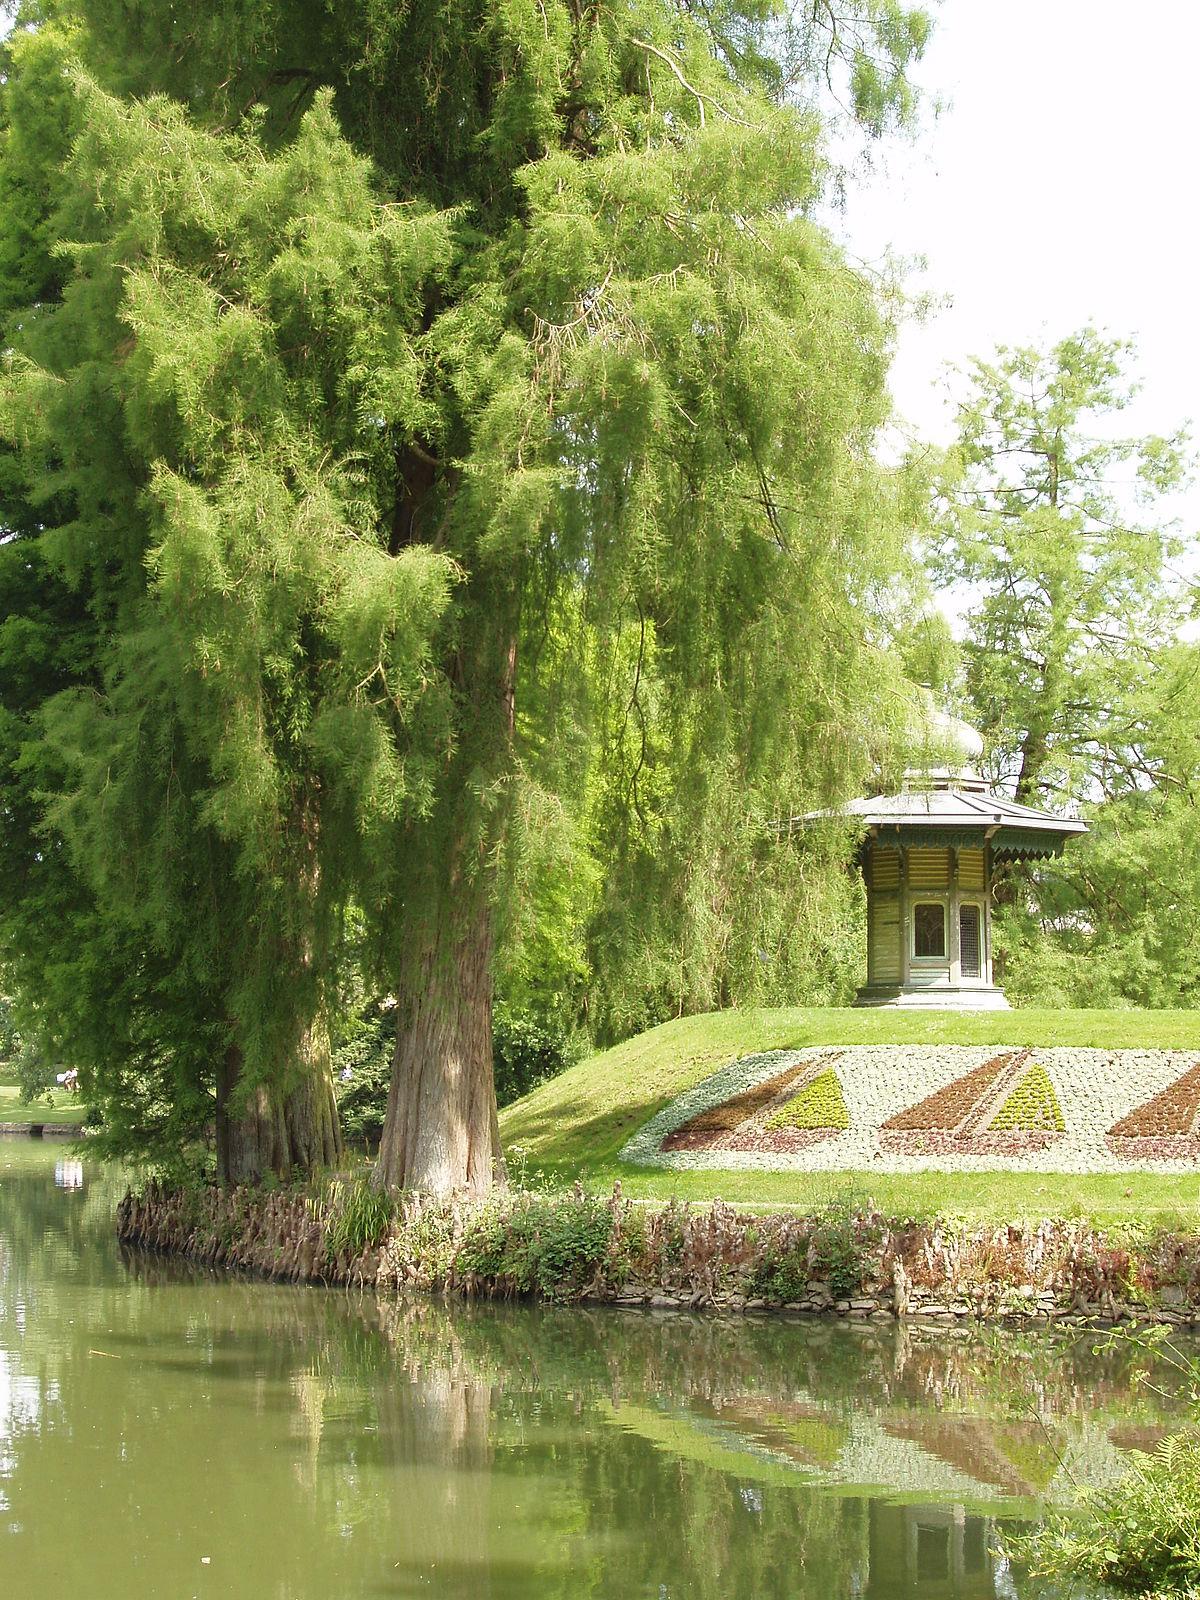 Jardin du parc wikip dia for Jardin wikipedia